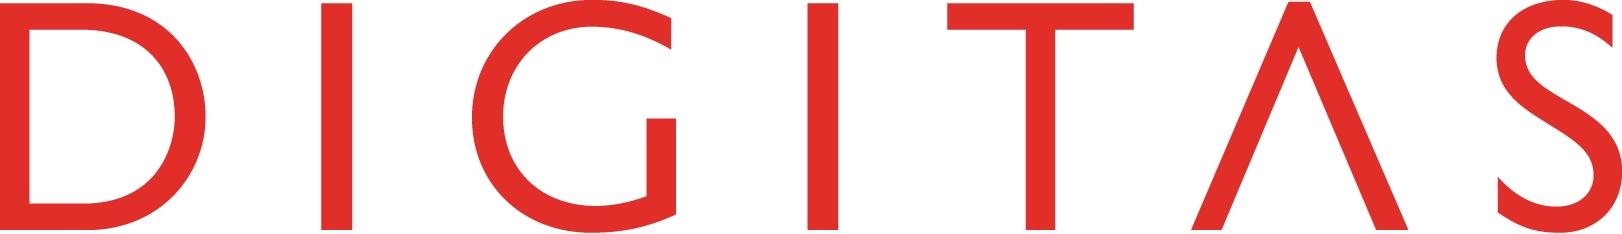 logo-digitas.jpg